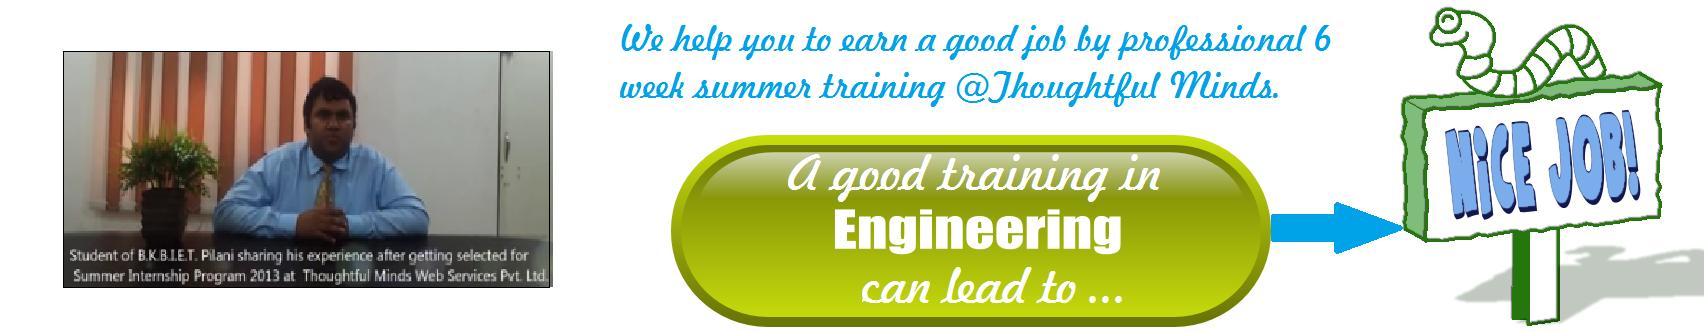 Registeration-for-6-week-summer-training-in-Jaipur